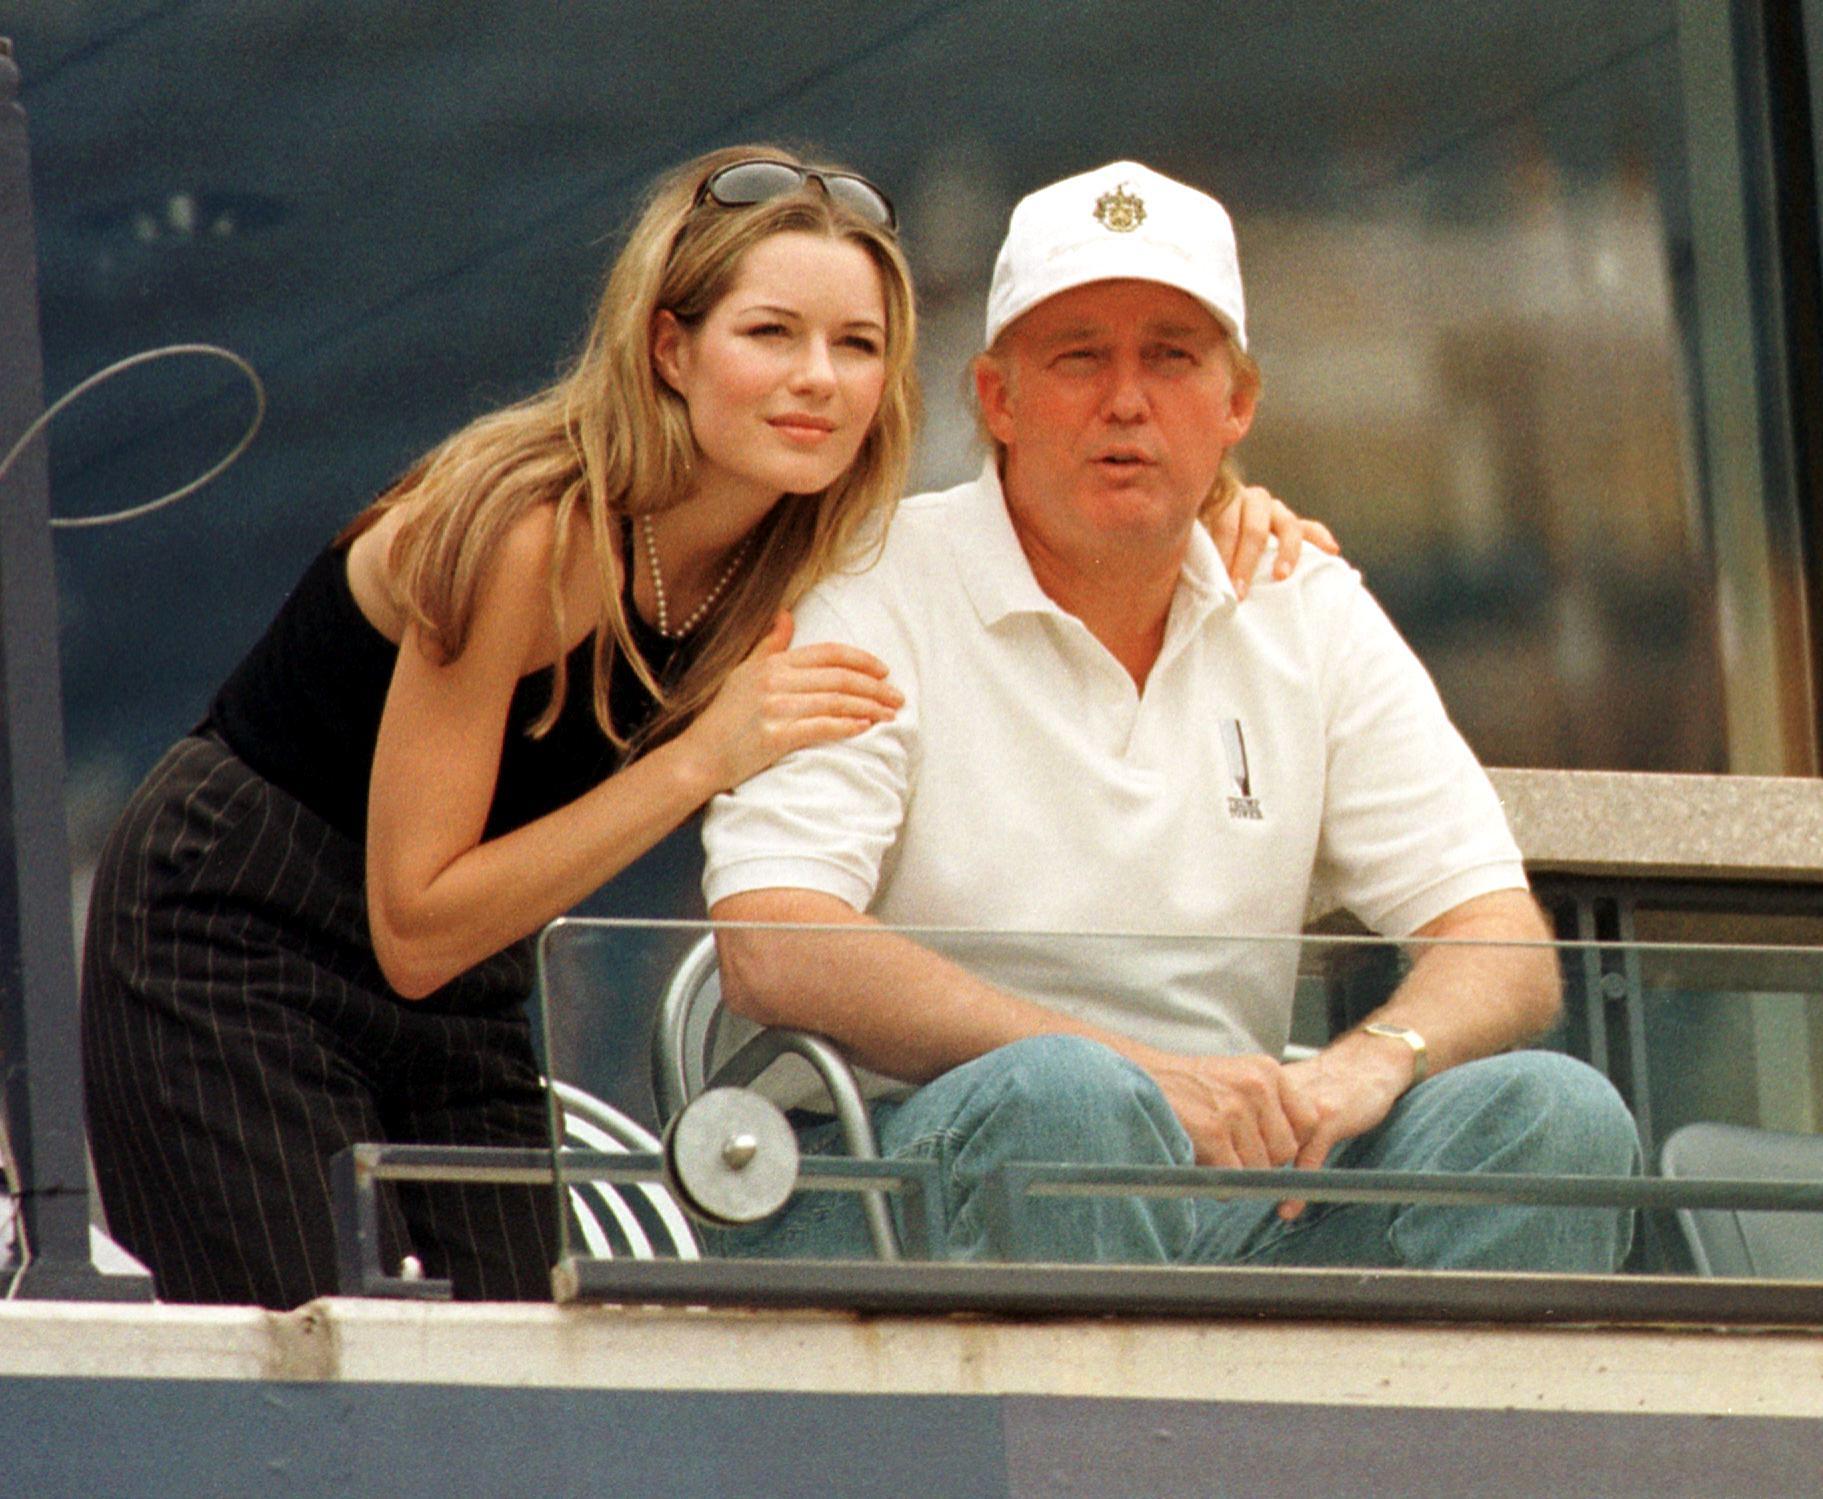 Donald Trump and girlfriend